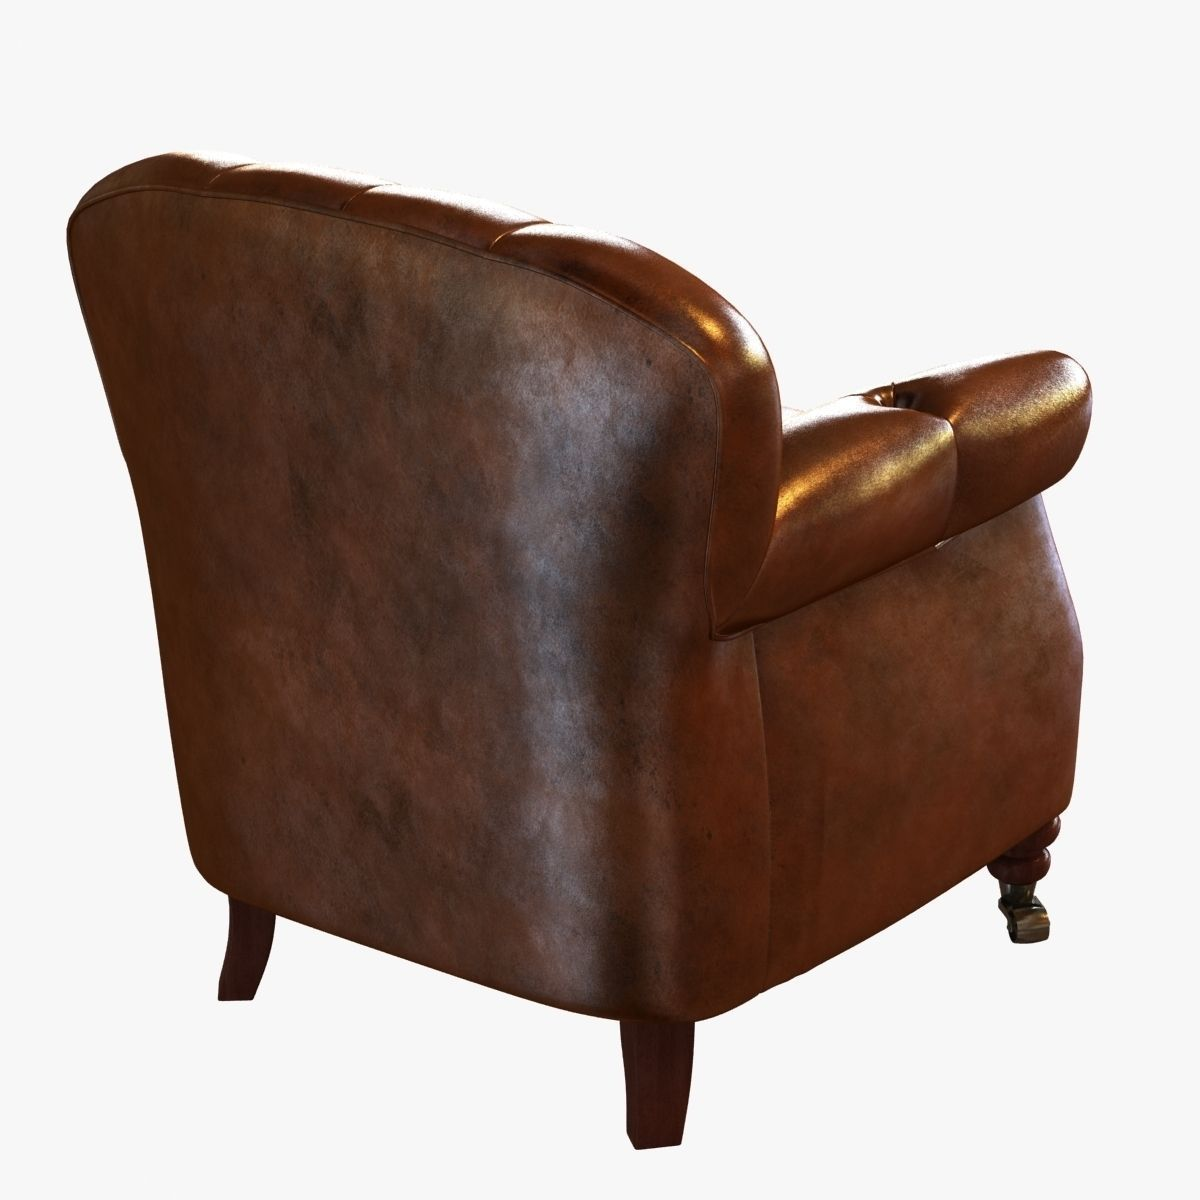 noir furniture chairs hanging chair takealot club vintage cigar le 3d model